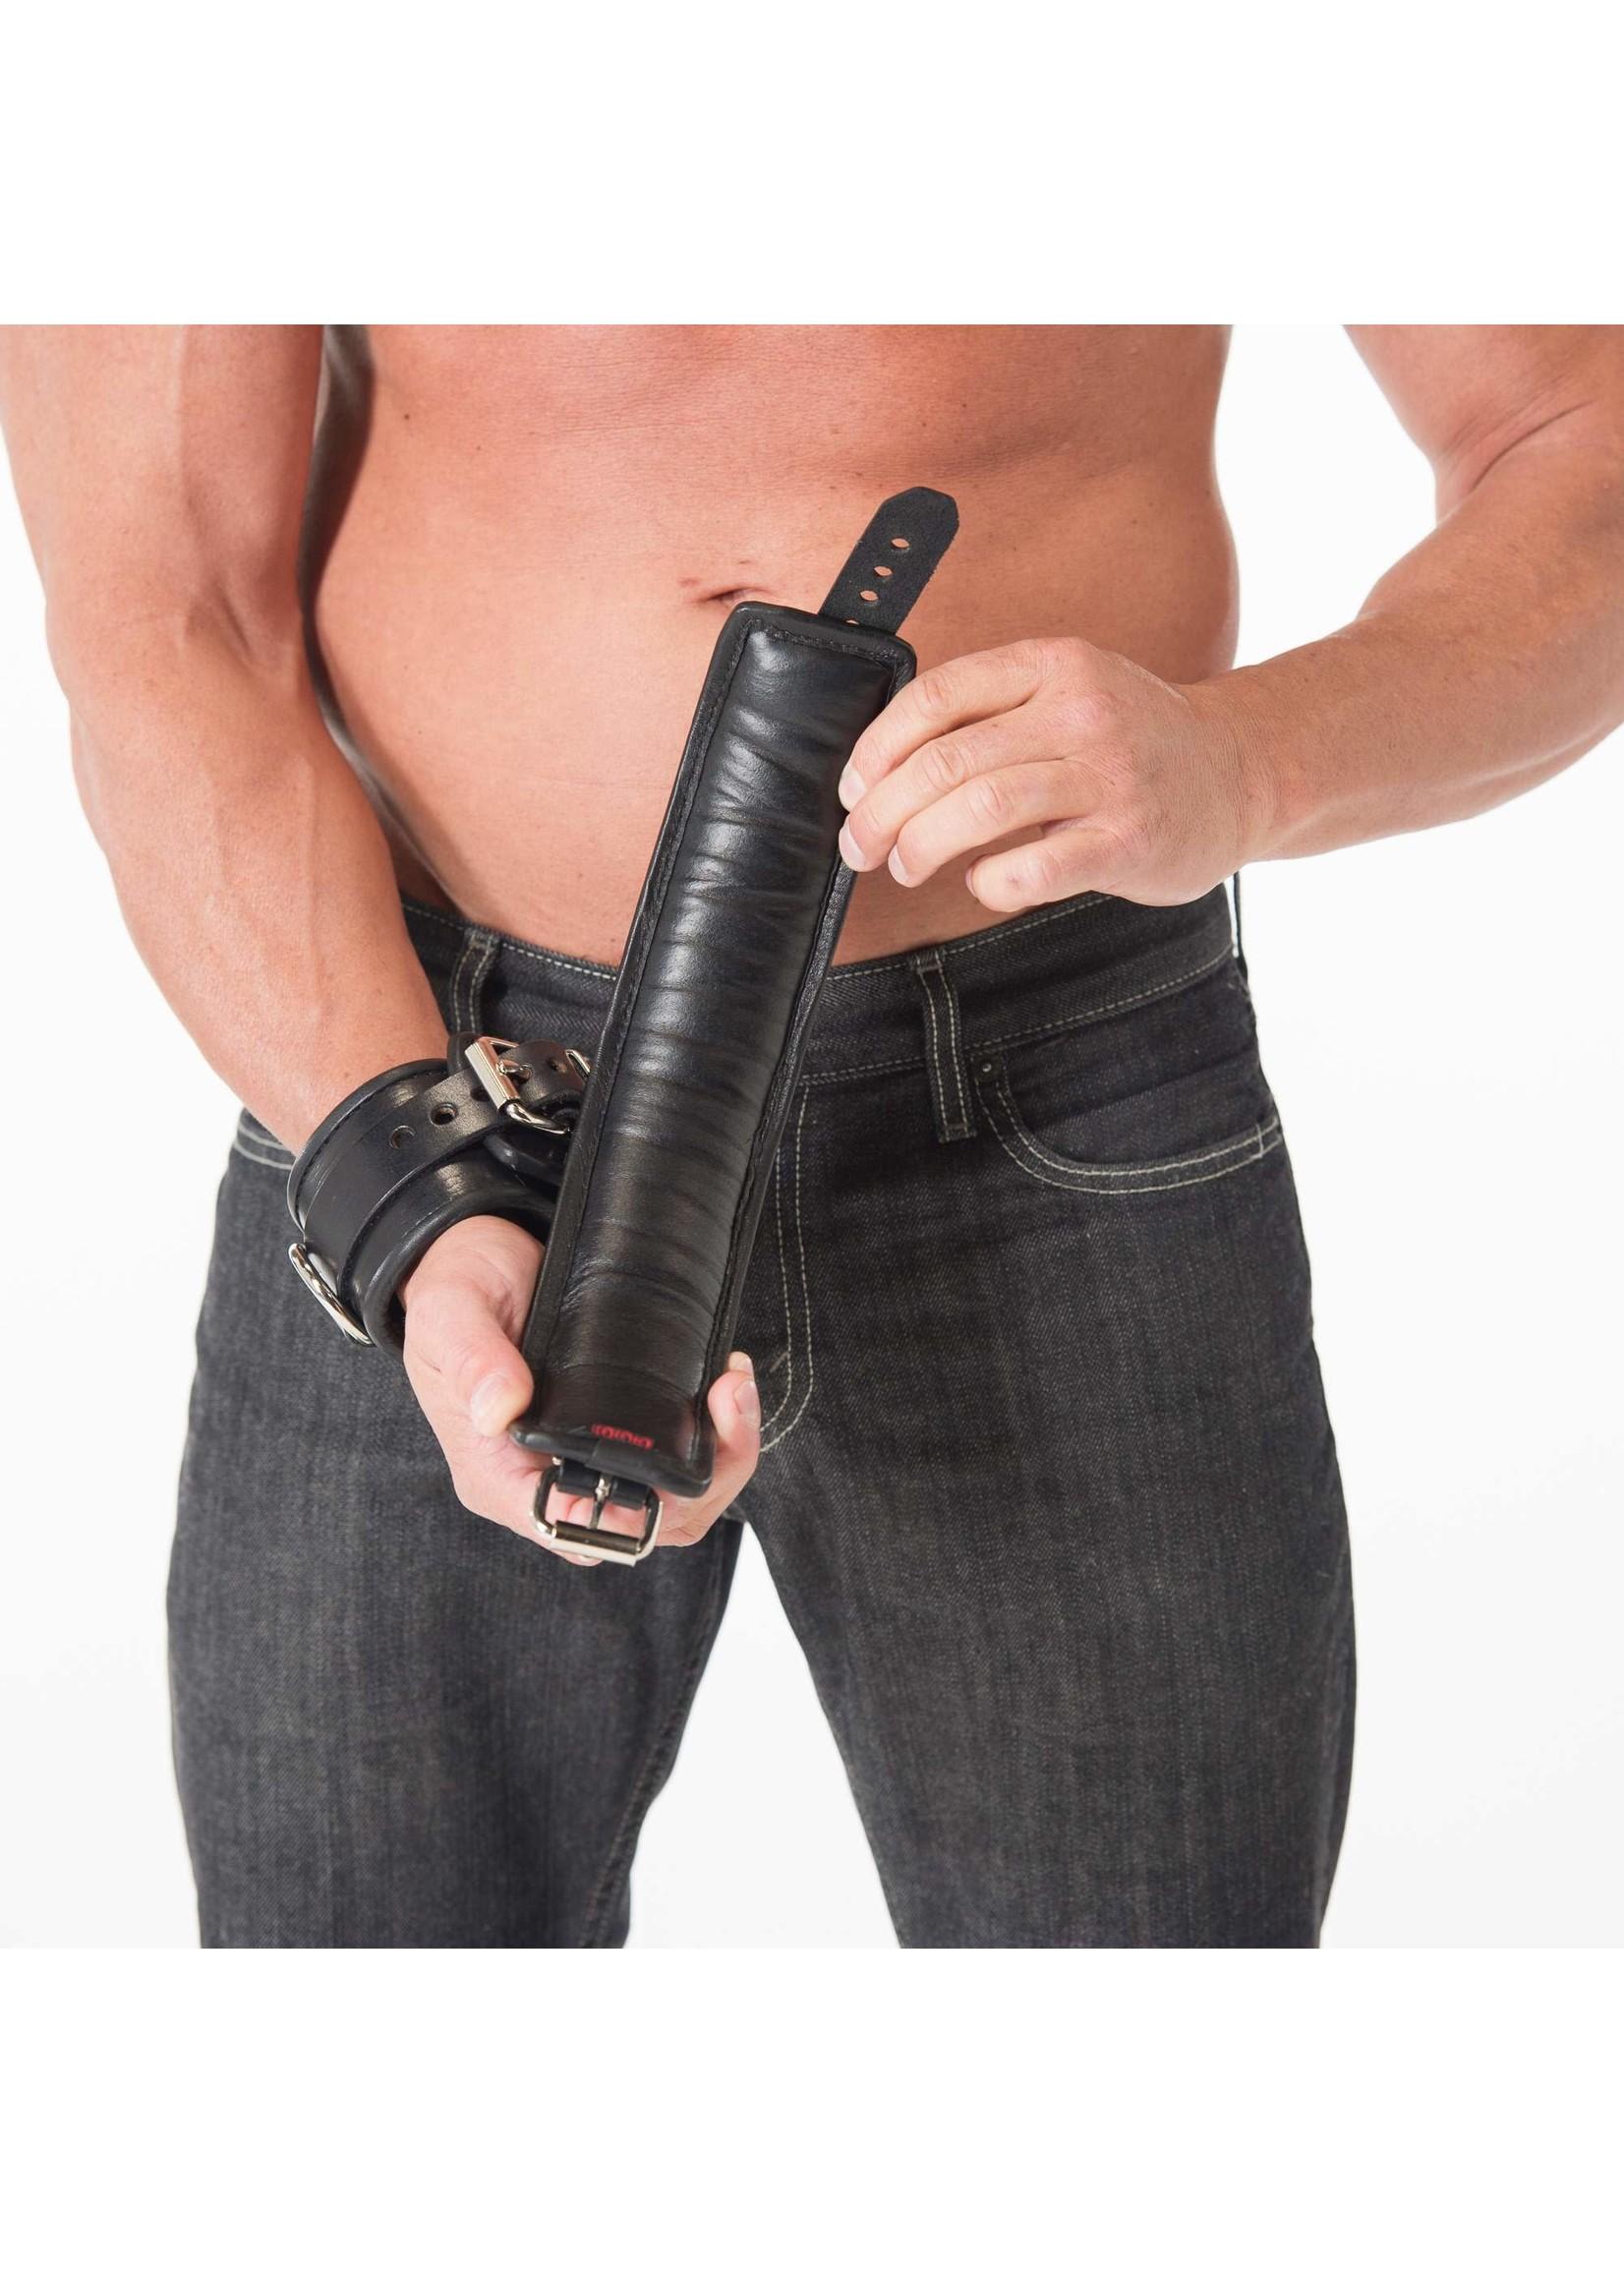 665 Leather 665 Padded Locking Wrist Restraints